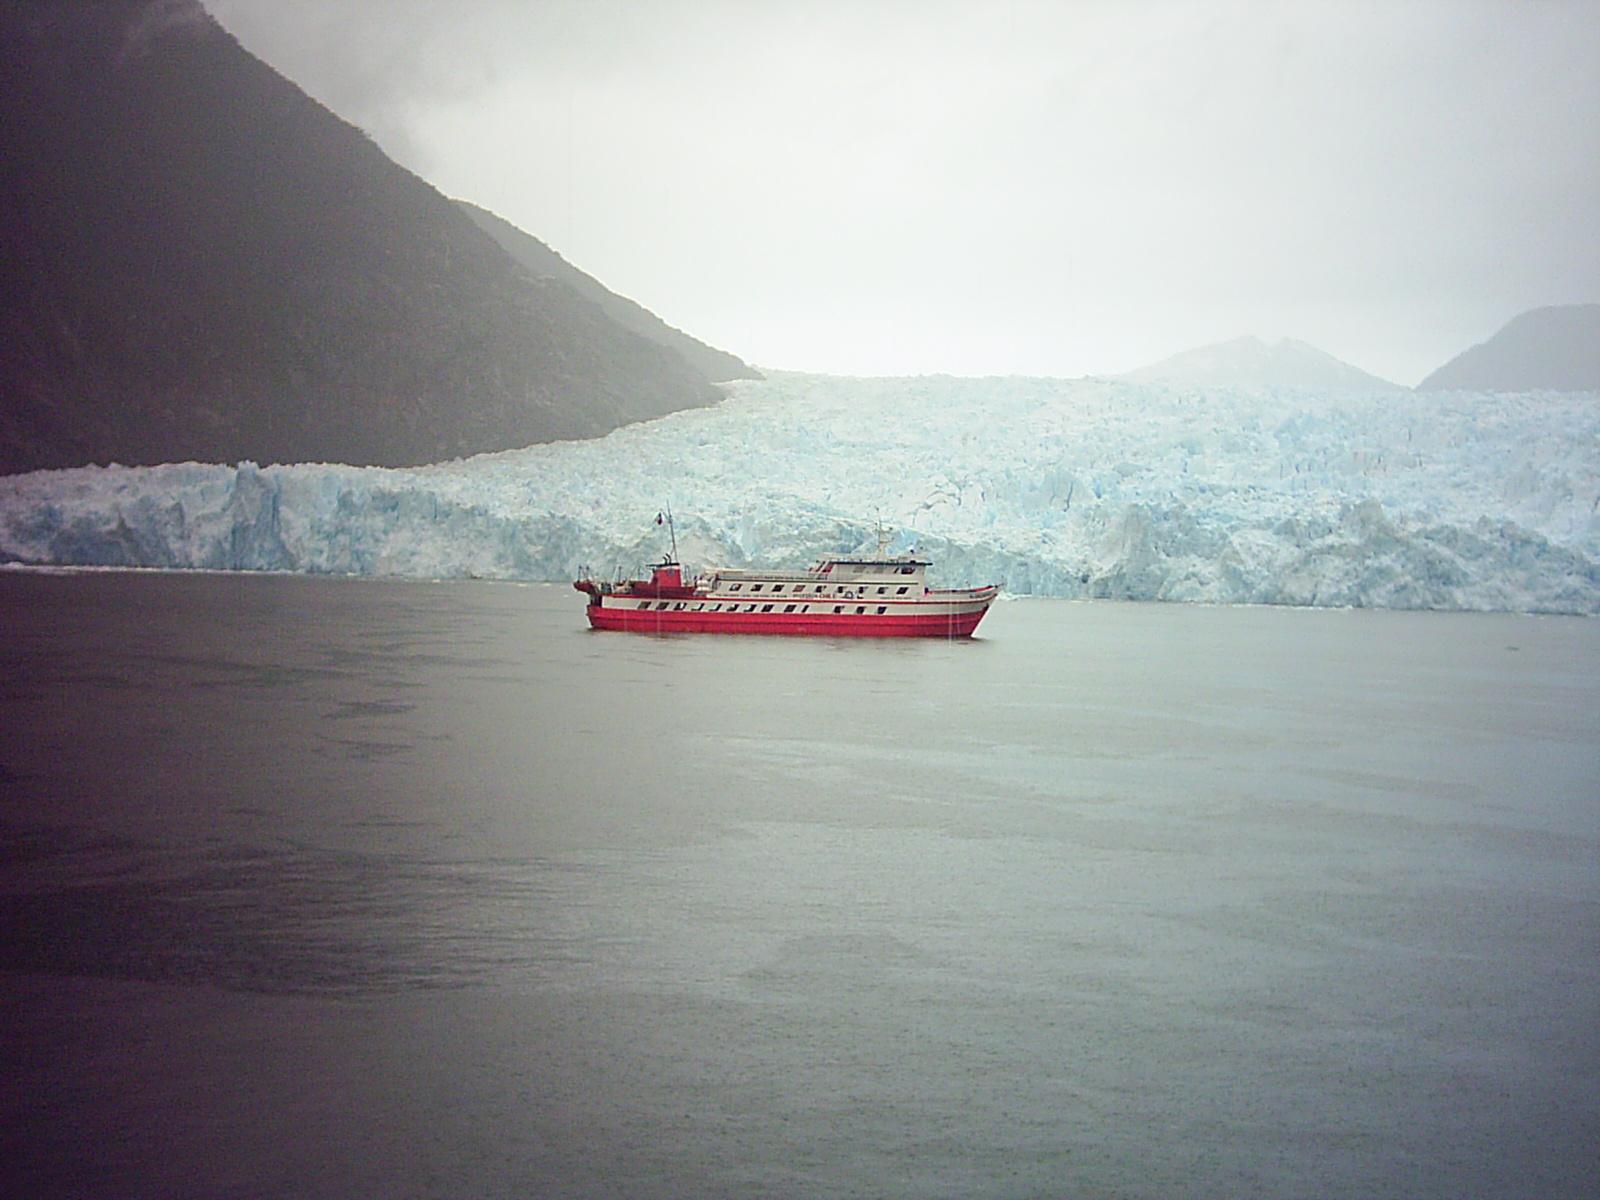 El ferry Skorpios